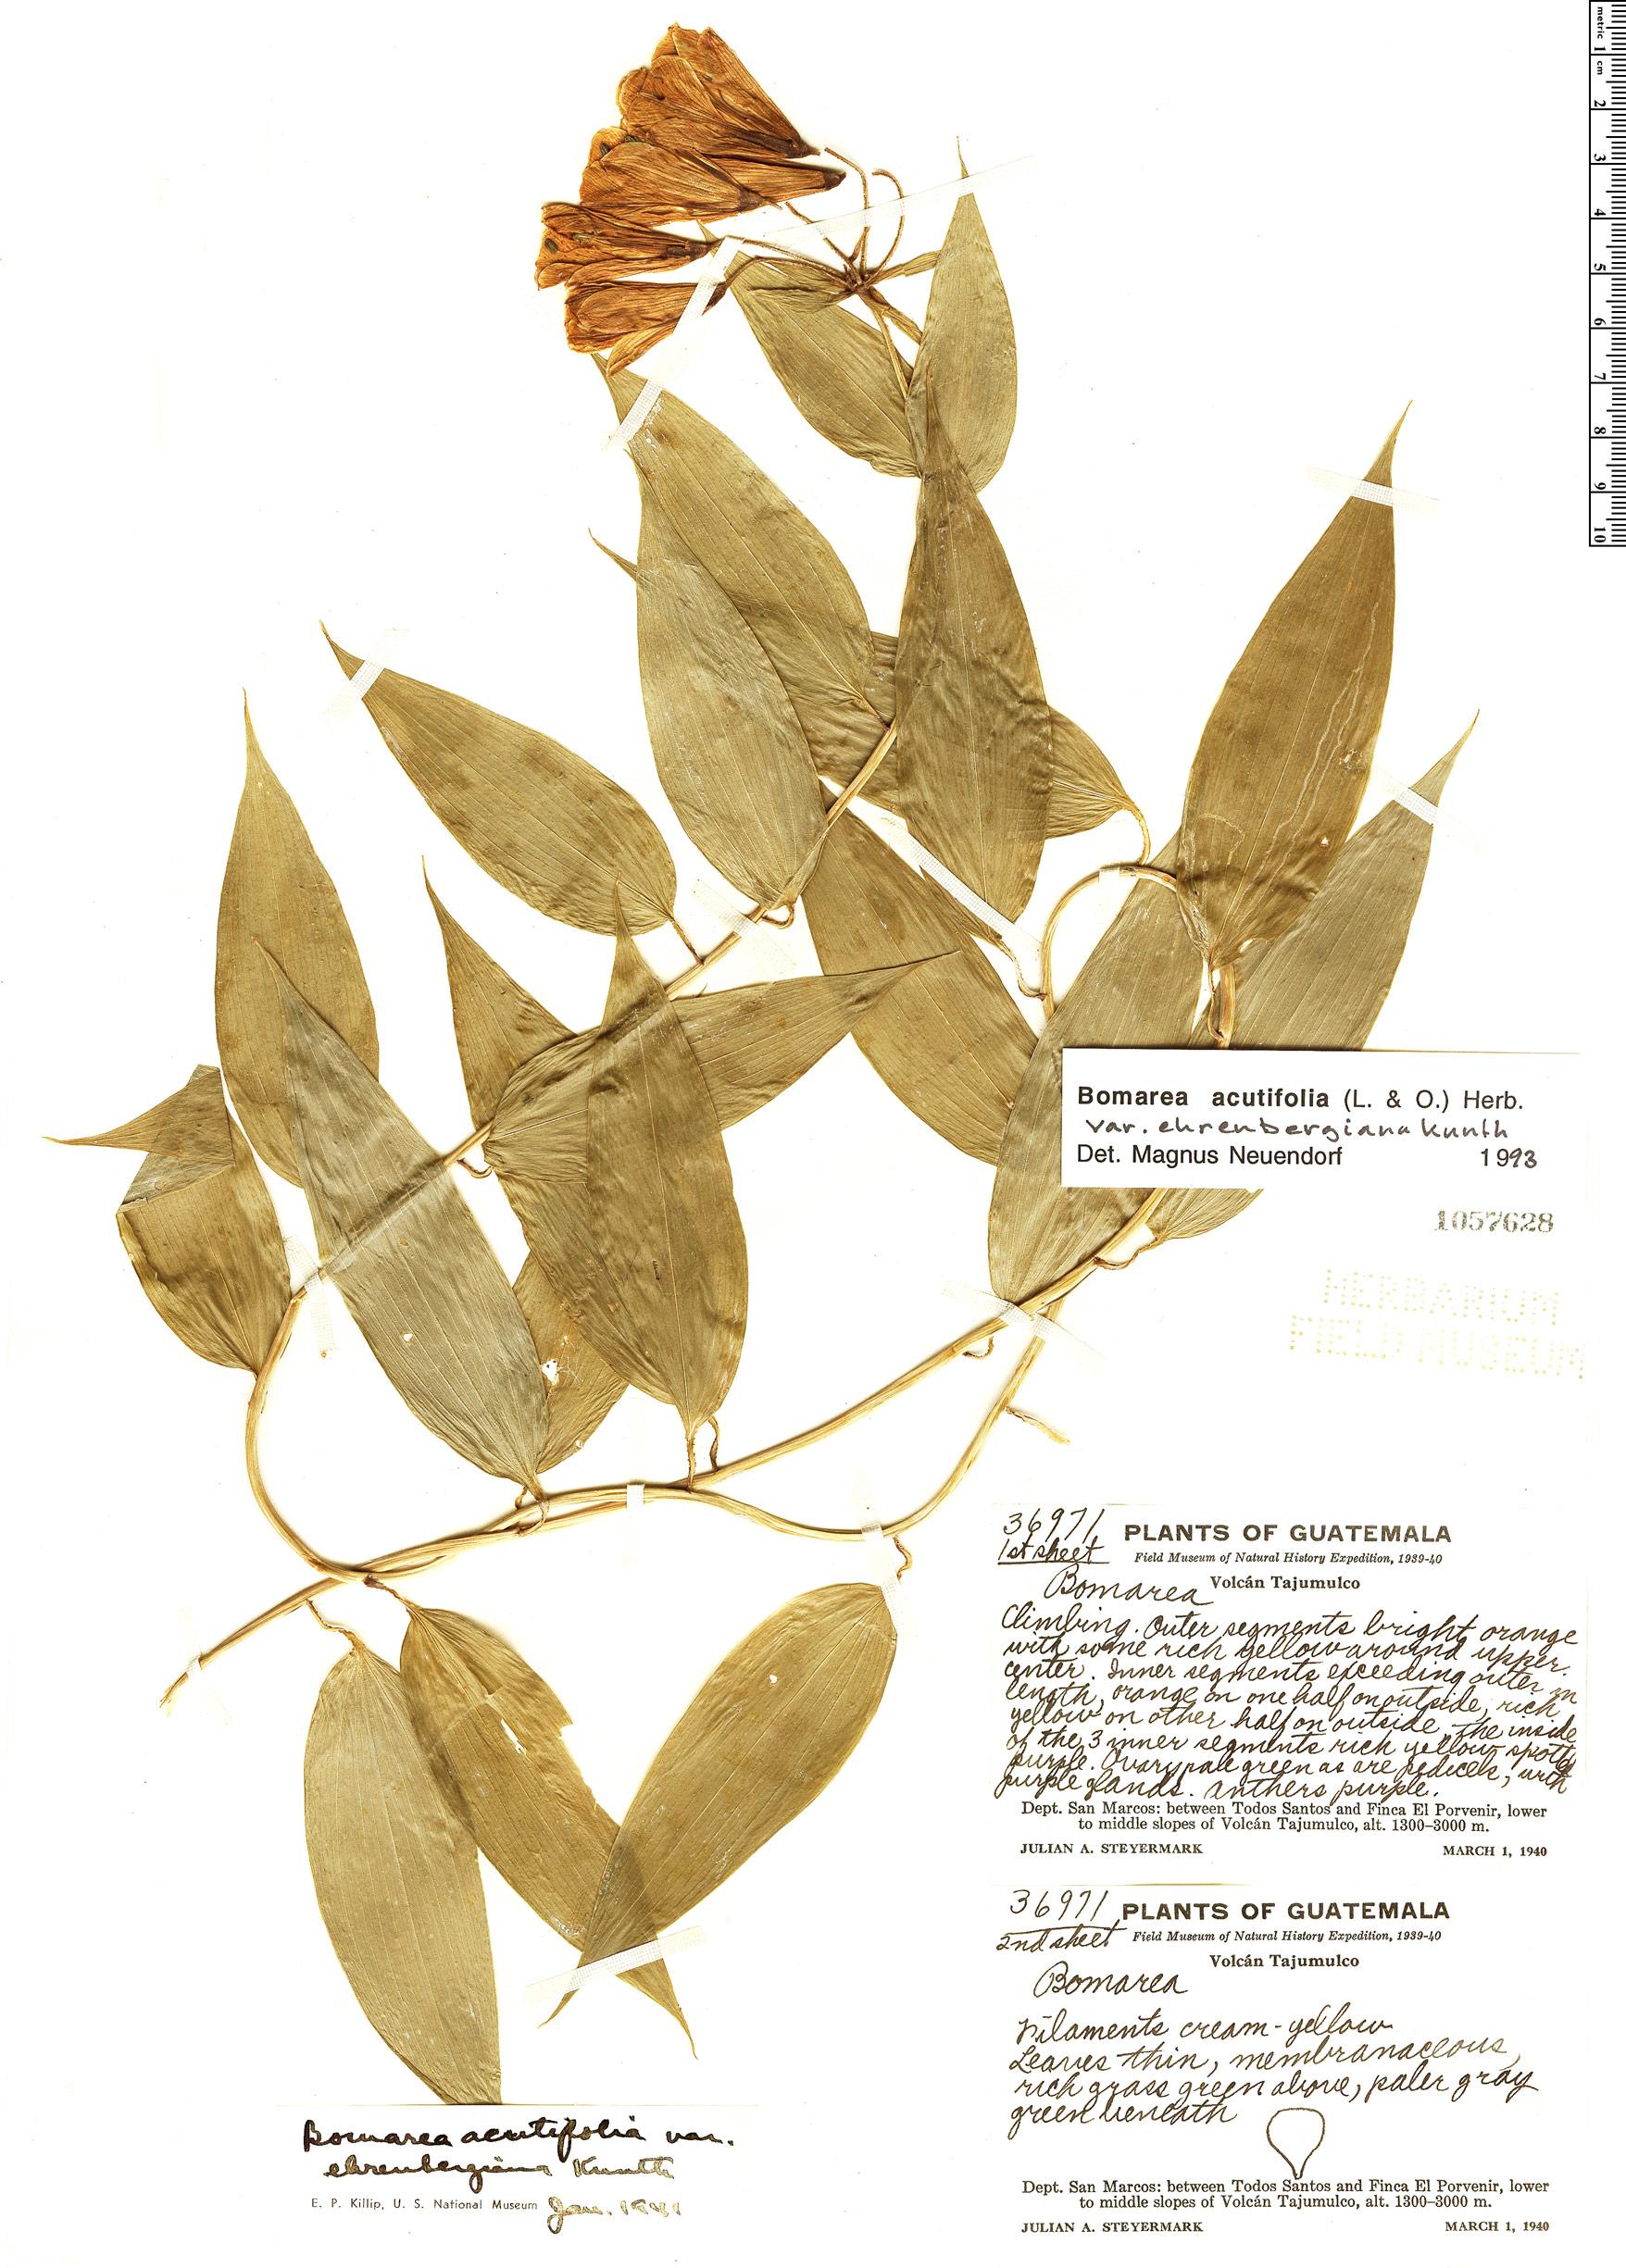 Specimen: Bomarea acutifolia